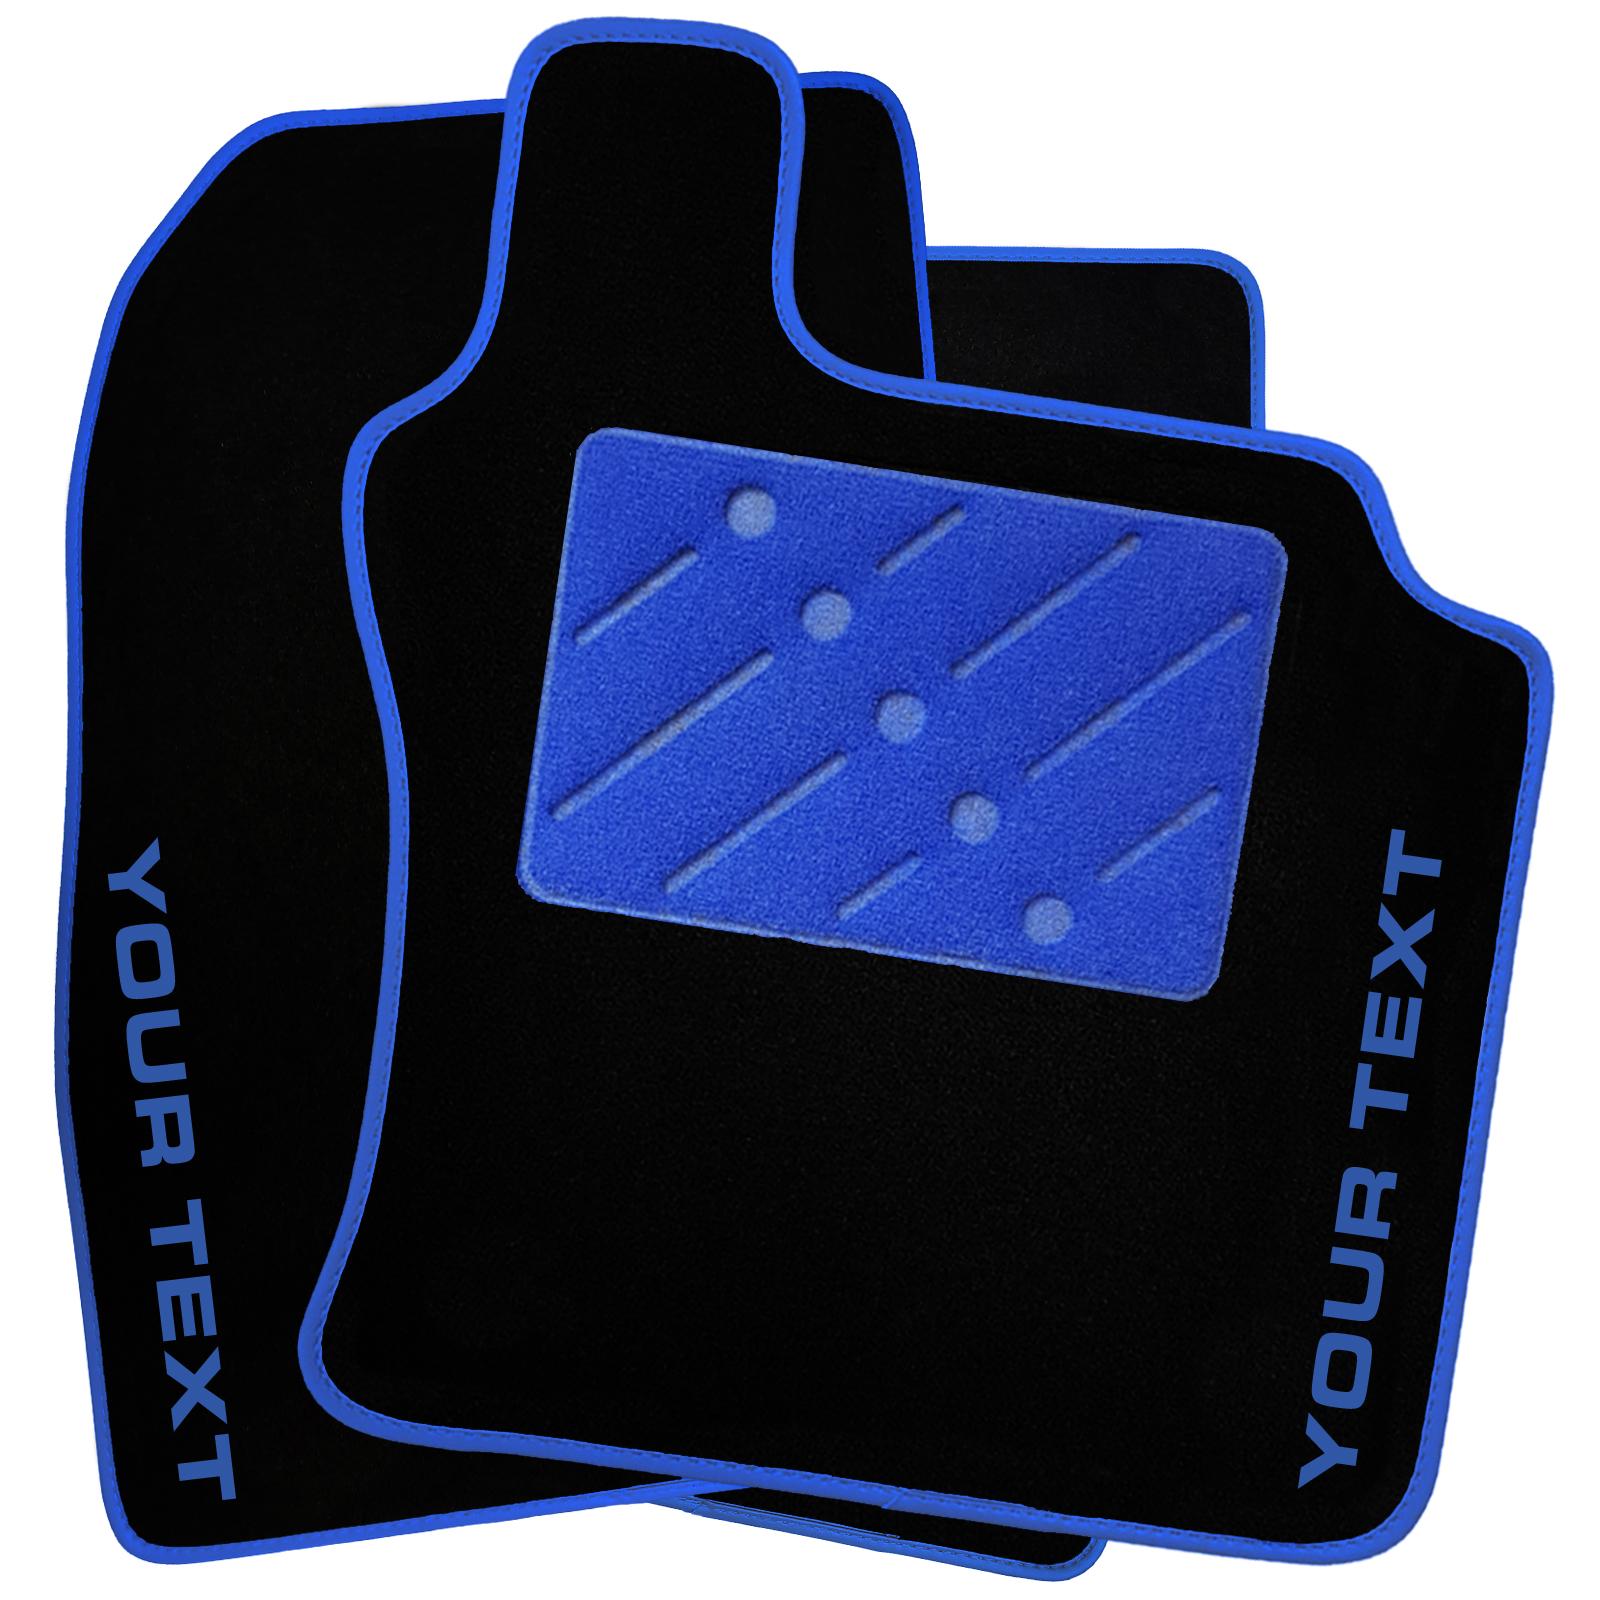 DAIHATSU FOURTRAK 84-02 Heavy Duty Waterproof Single Seat Cover Protector Black